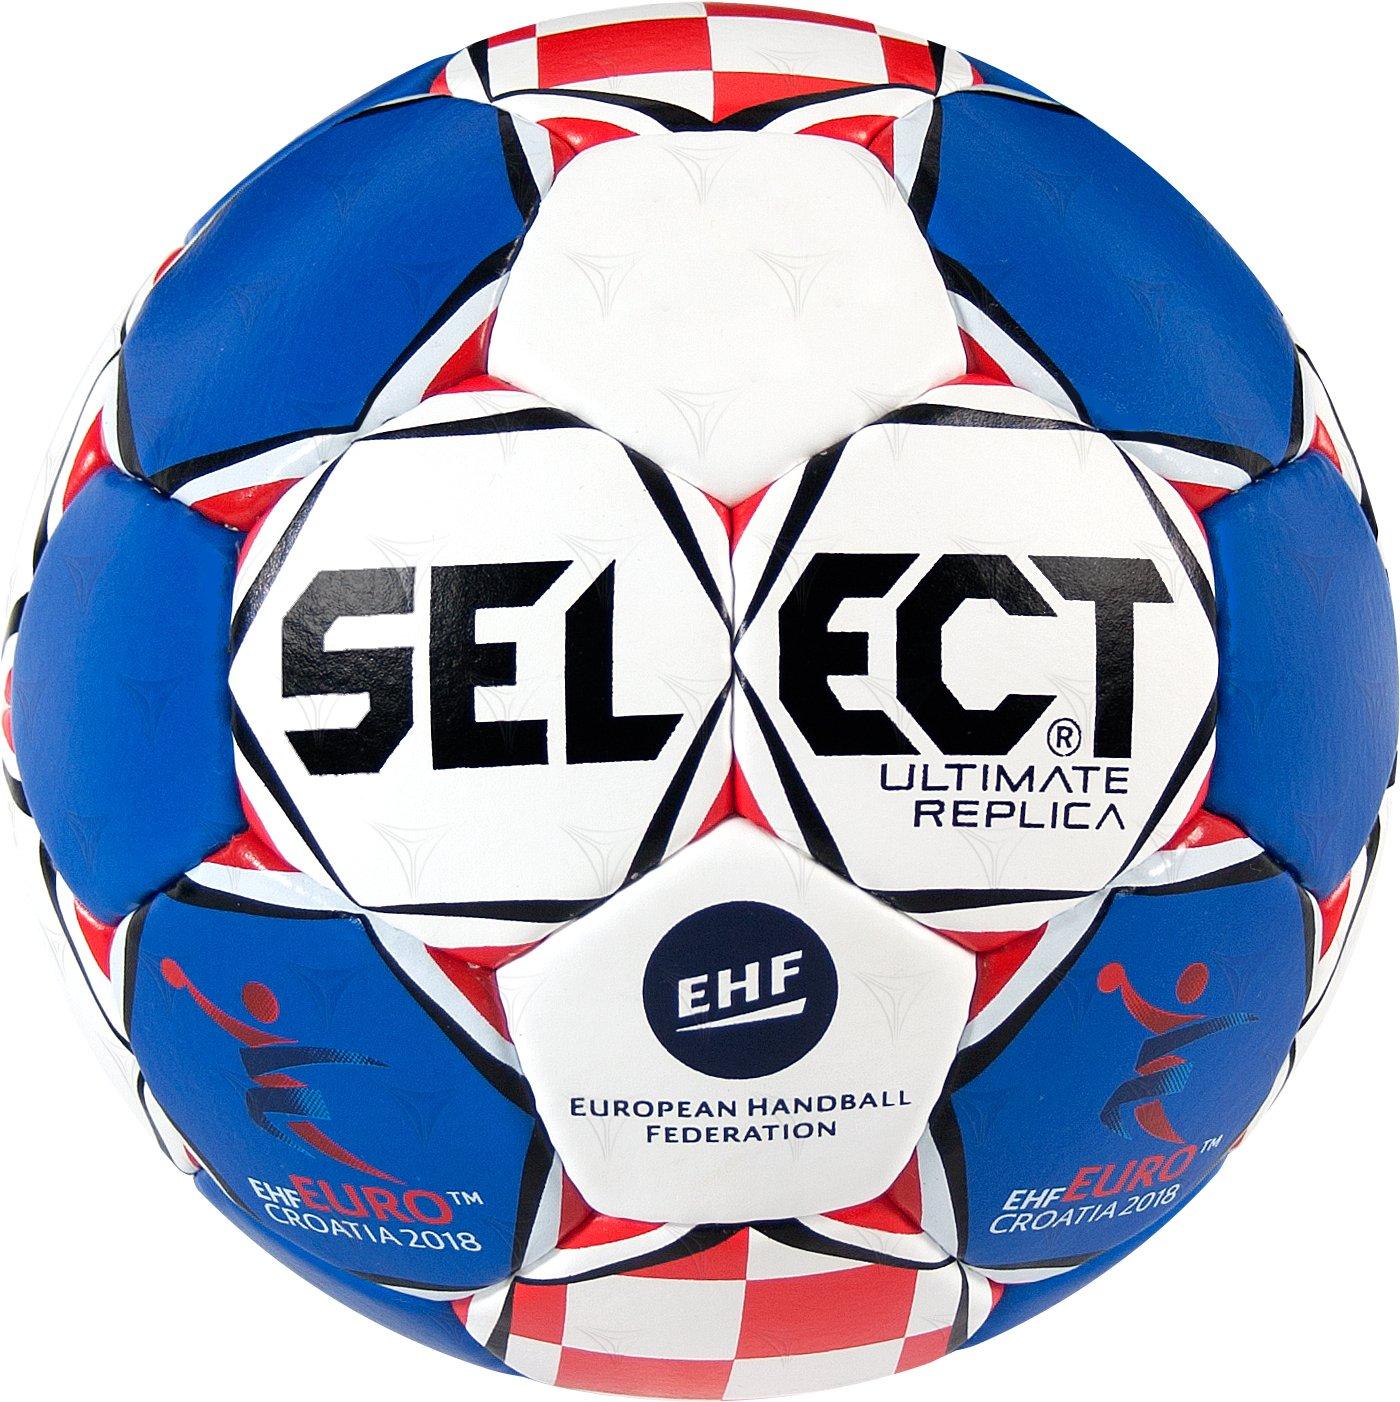 Select Ultimate Replica ehf Euro 2018Handball